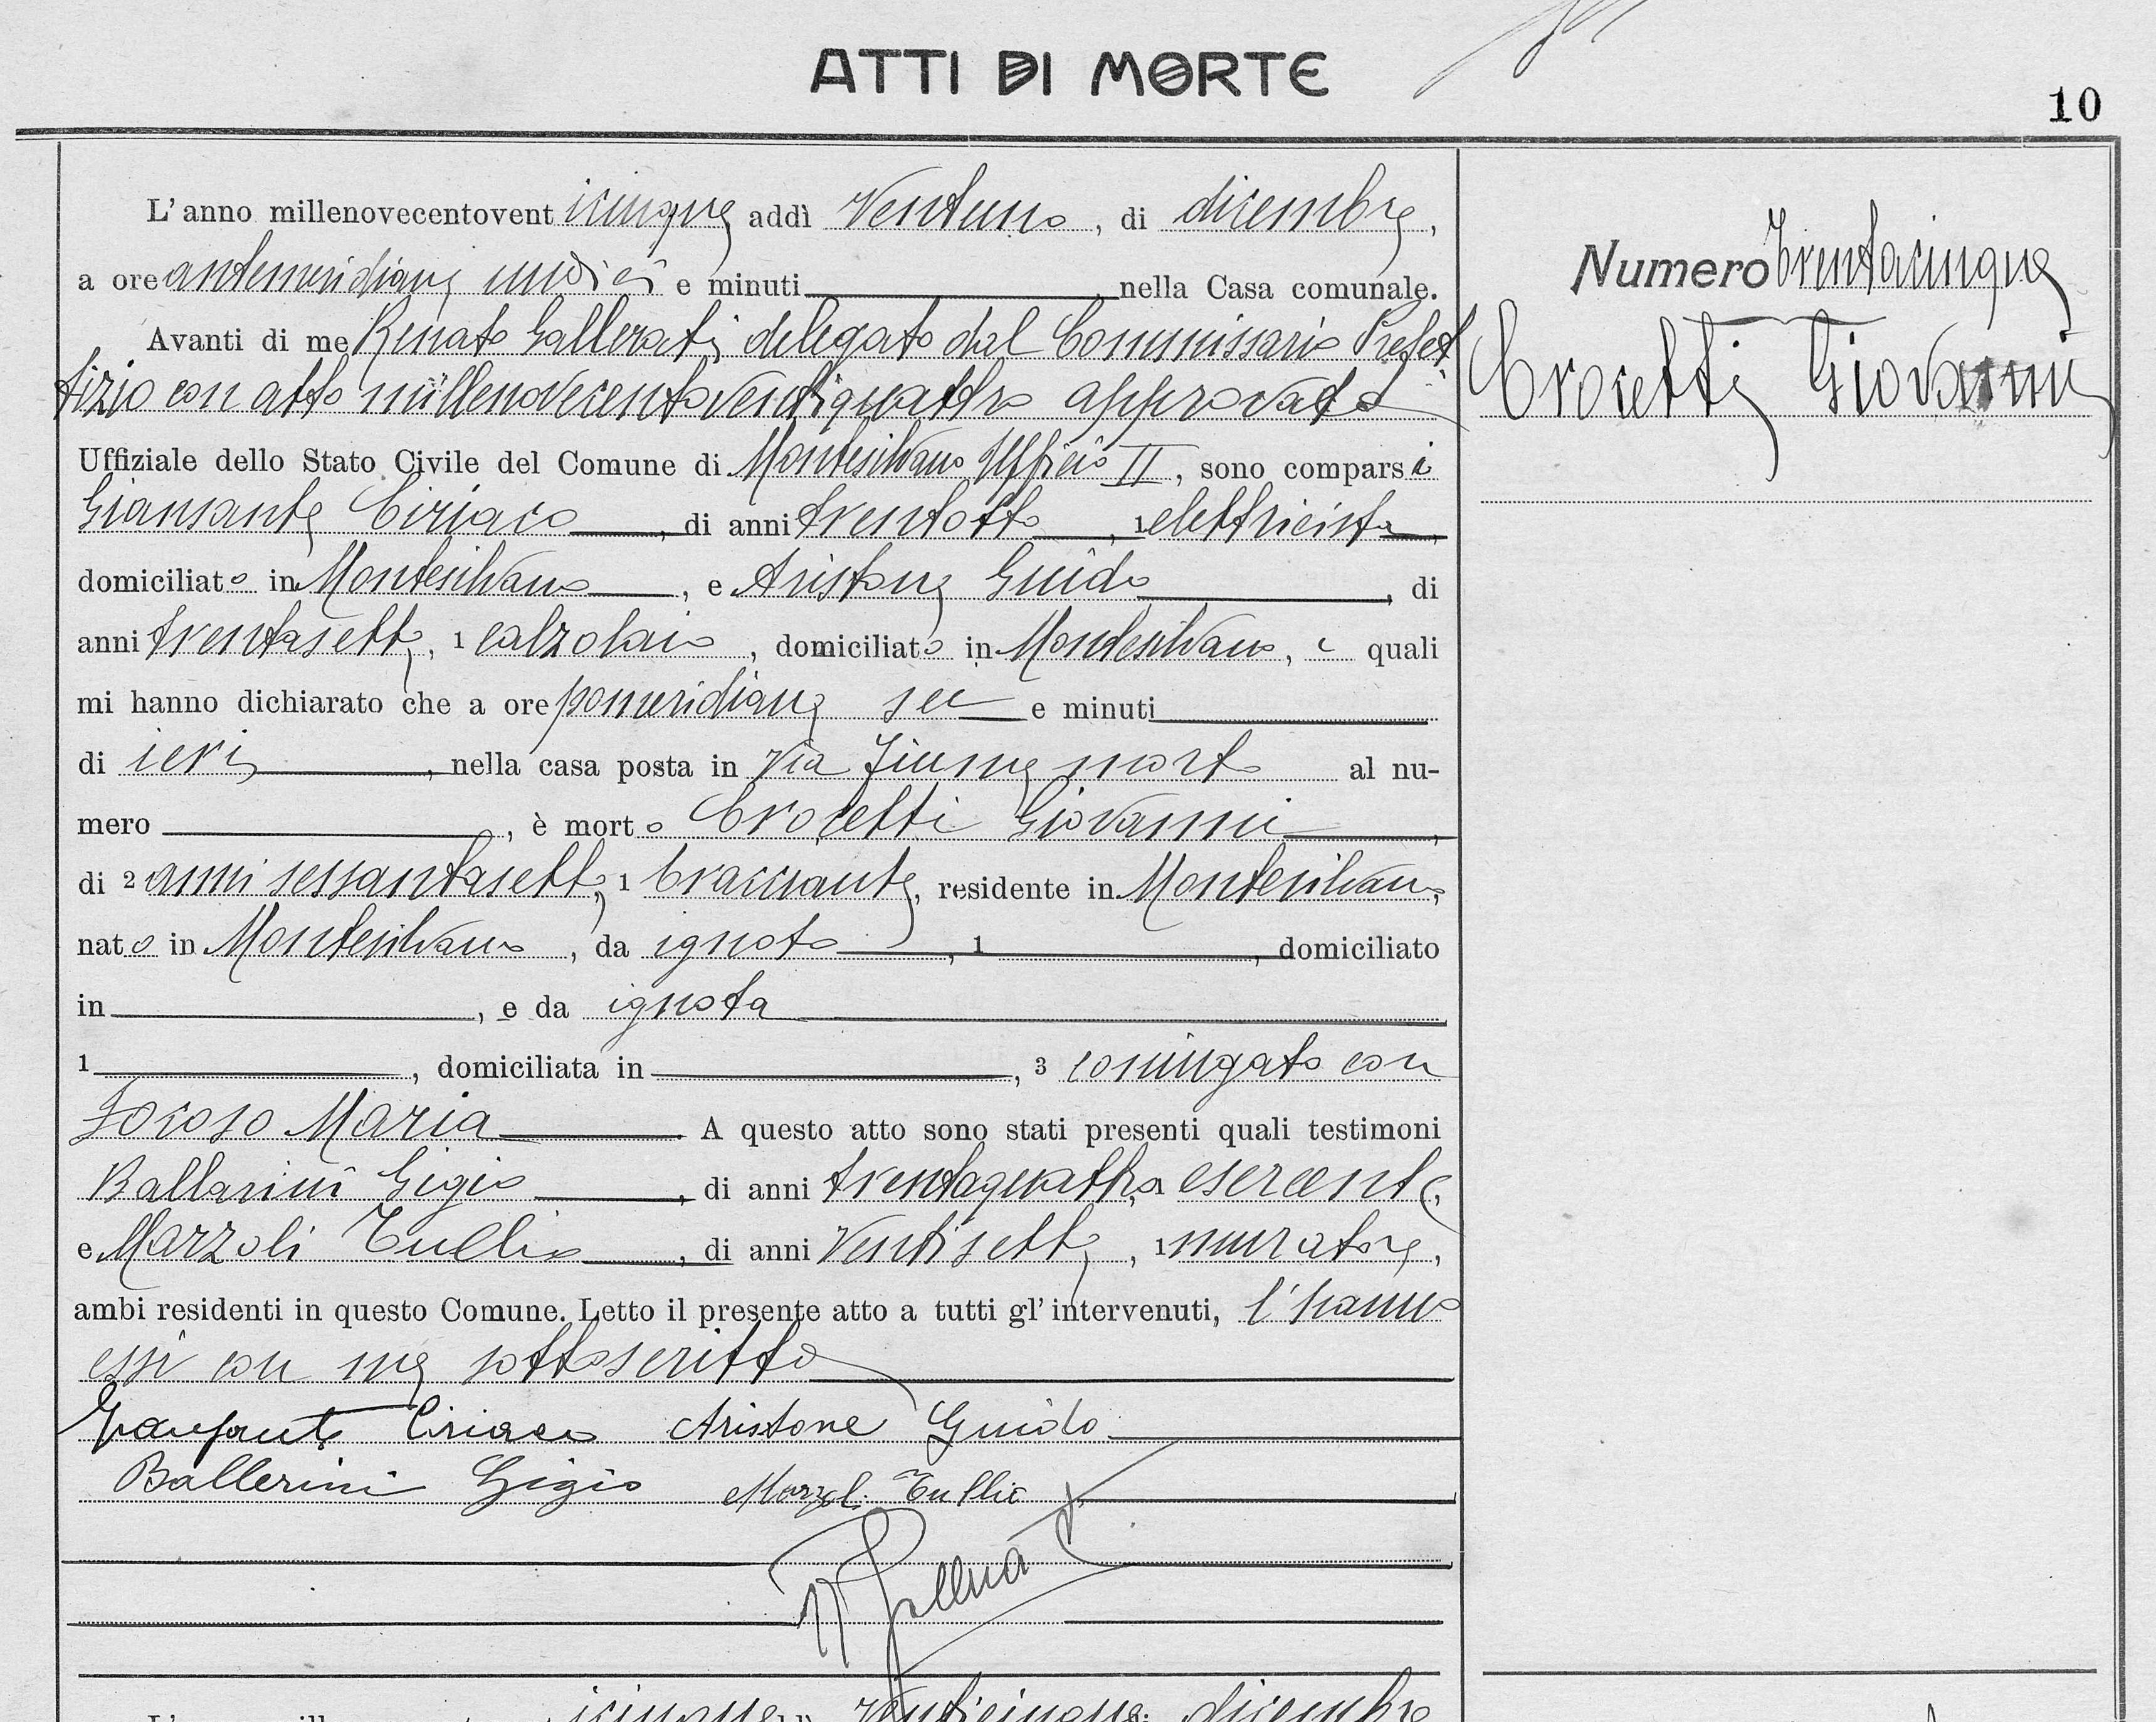 http://www.genealogiafamiliare.it/wp/wp-content/uploads/2018/03/Death-Giovanni-Crocetti.jpg